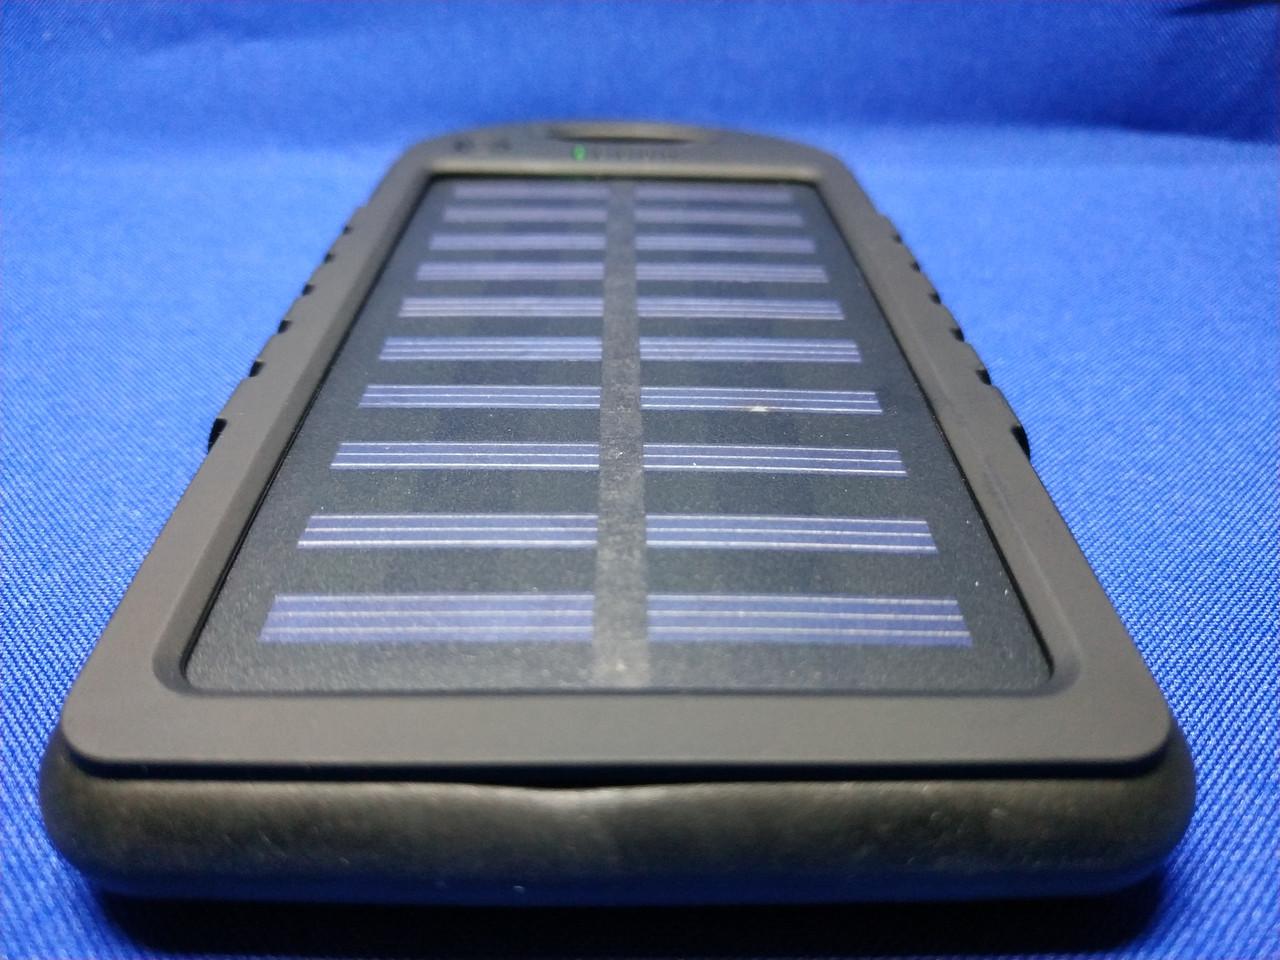 Power Bank Solar 10000mA на солнечных батареях с фонариком (черный)